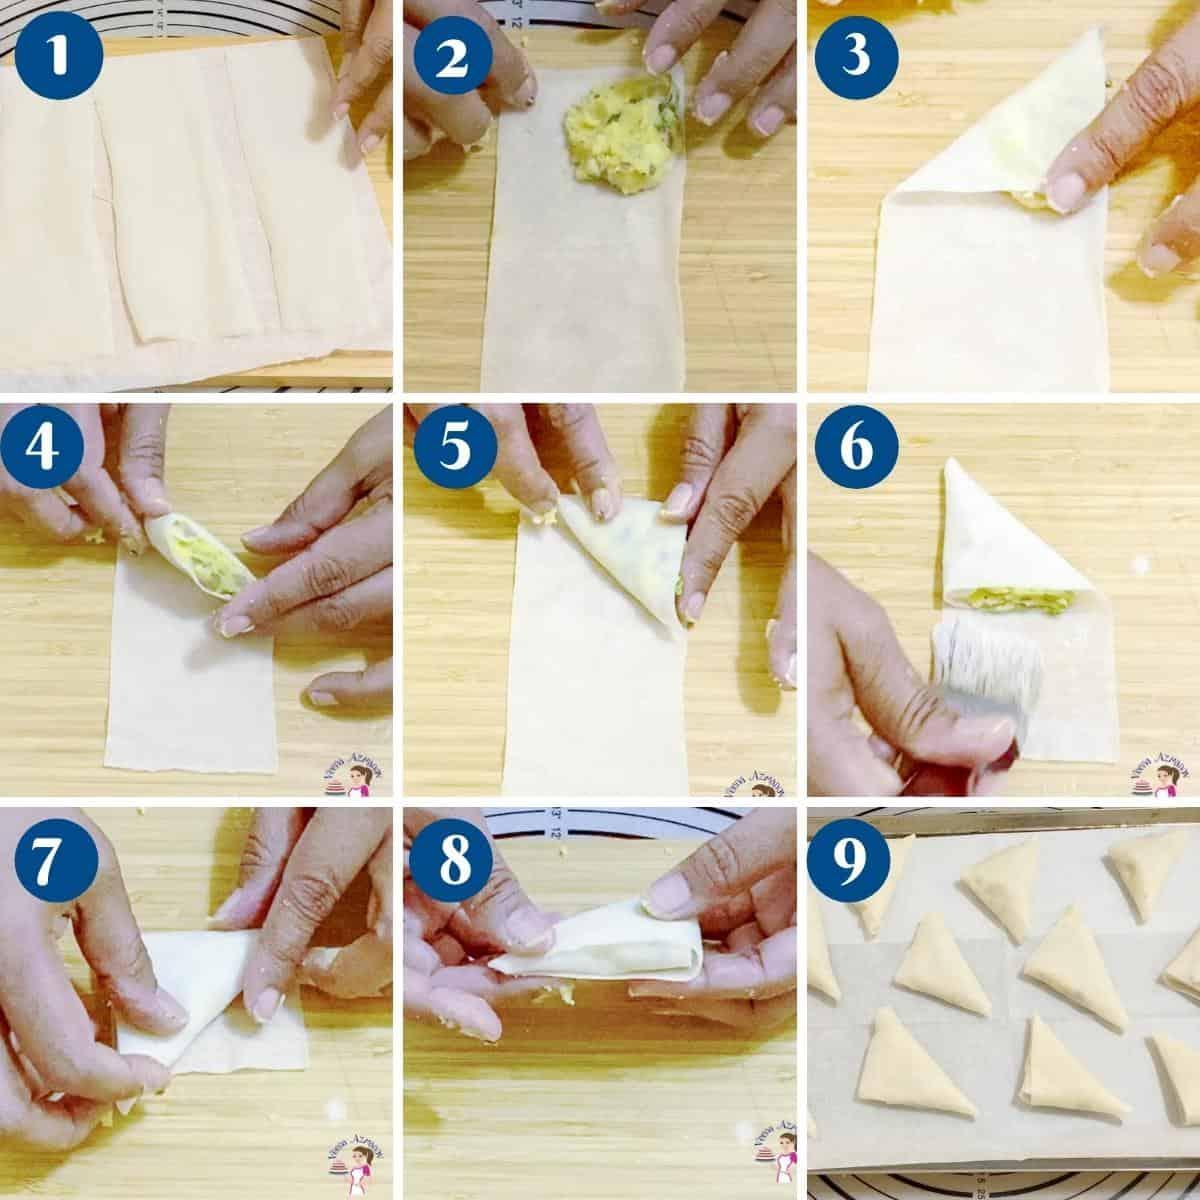 How to shape the classic samosa.